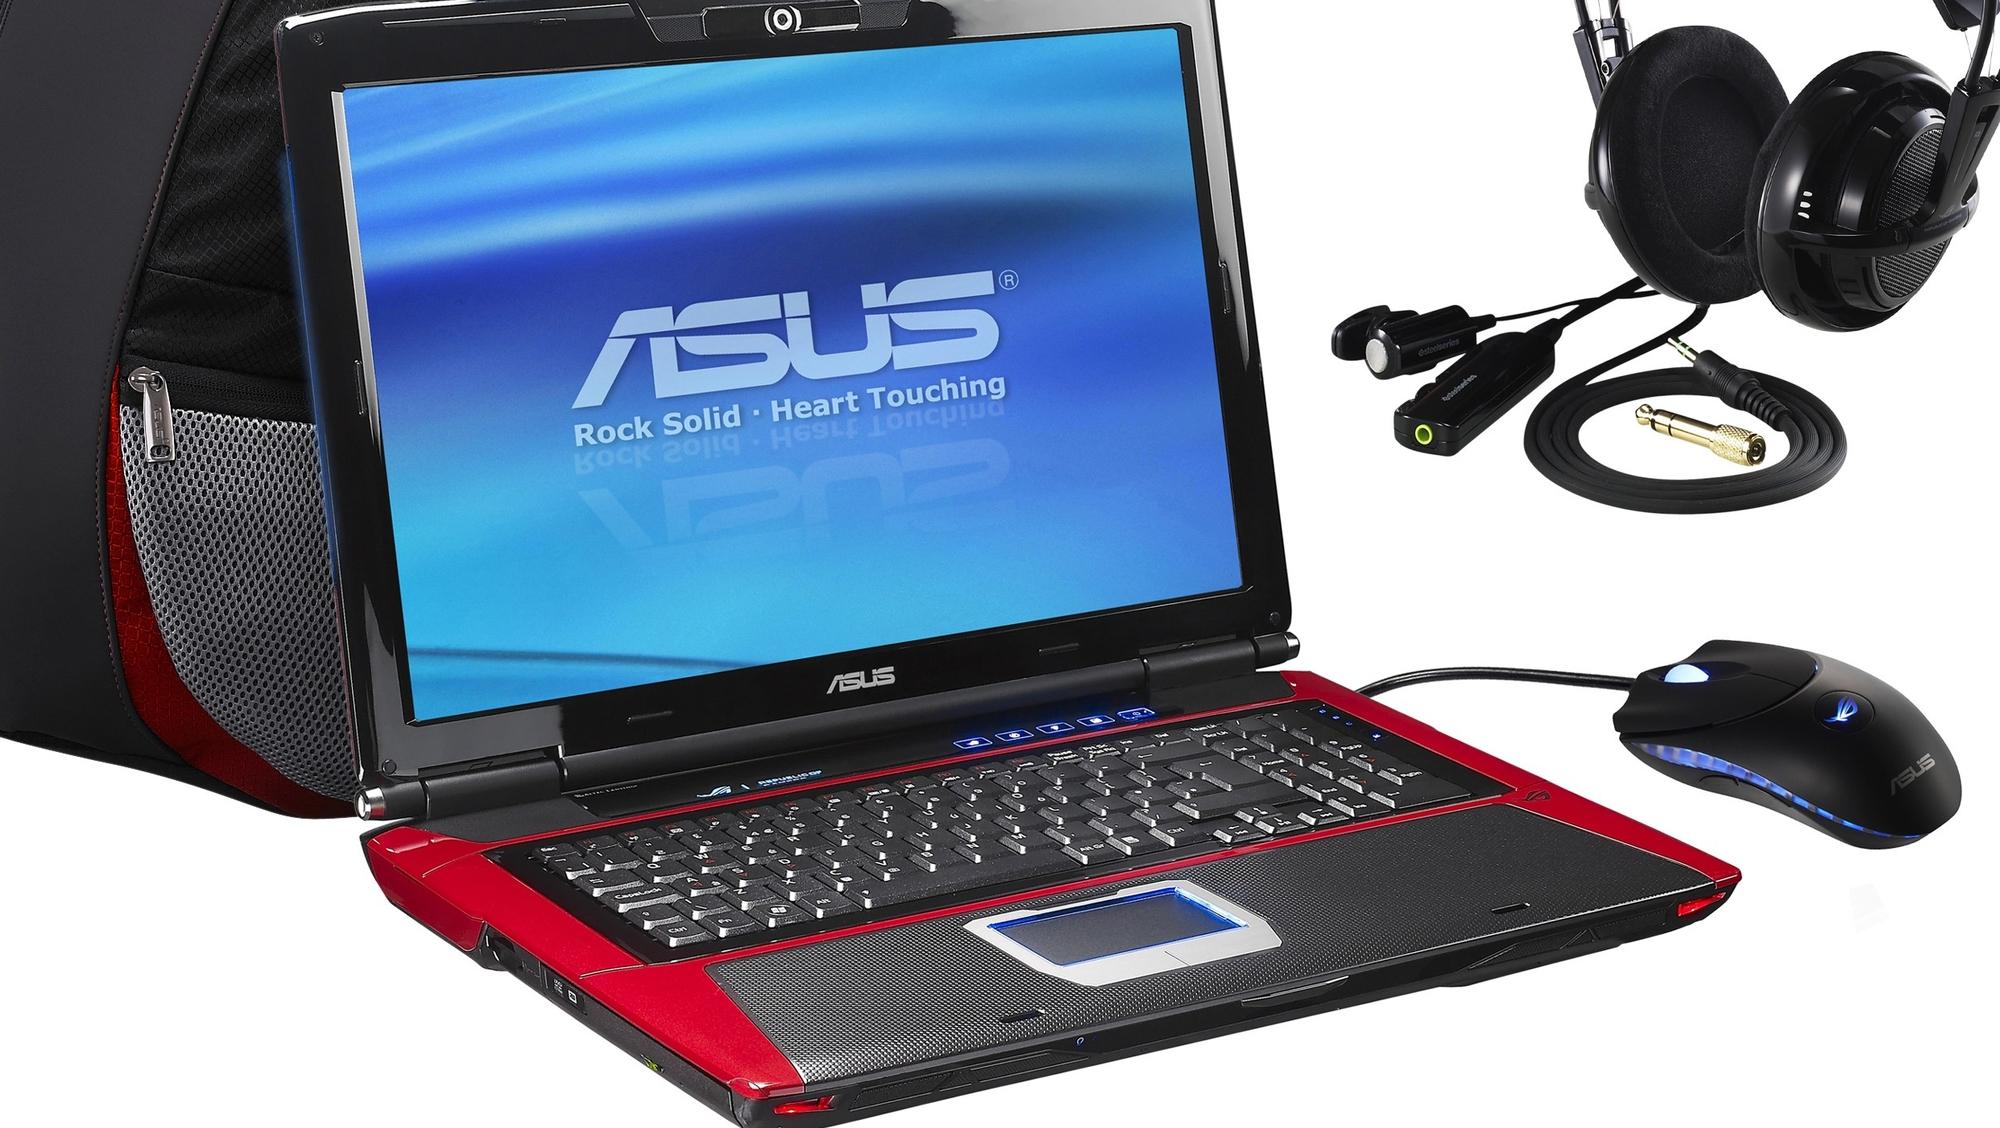 ASUS G71_Package_Hires